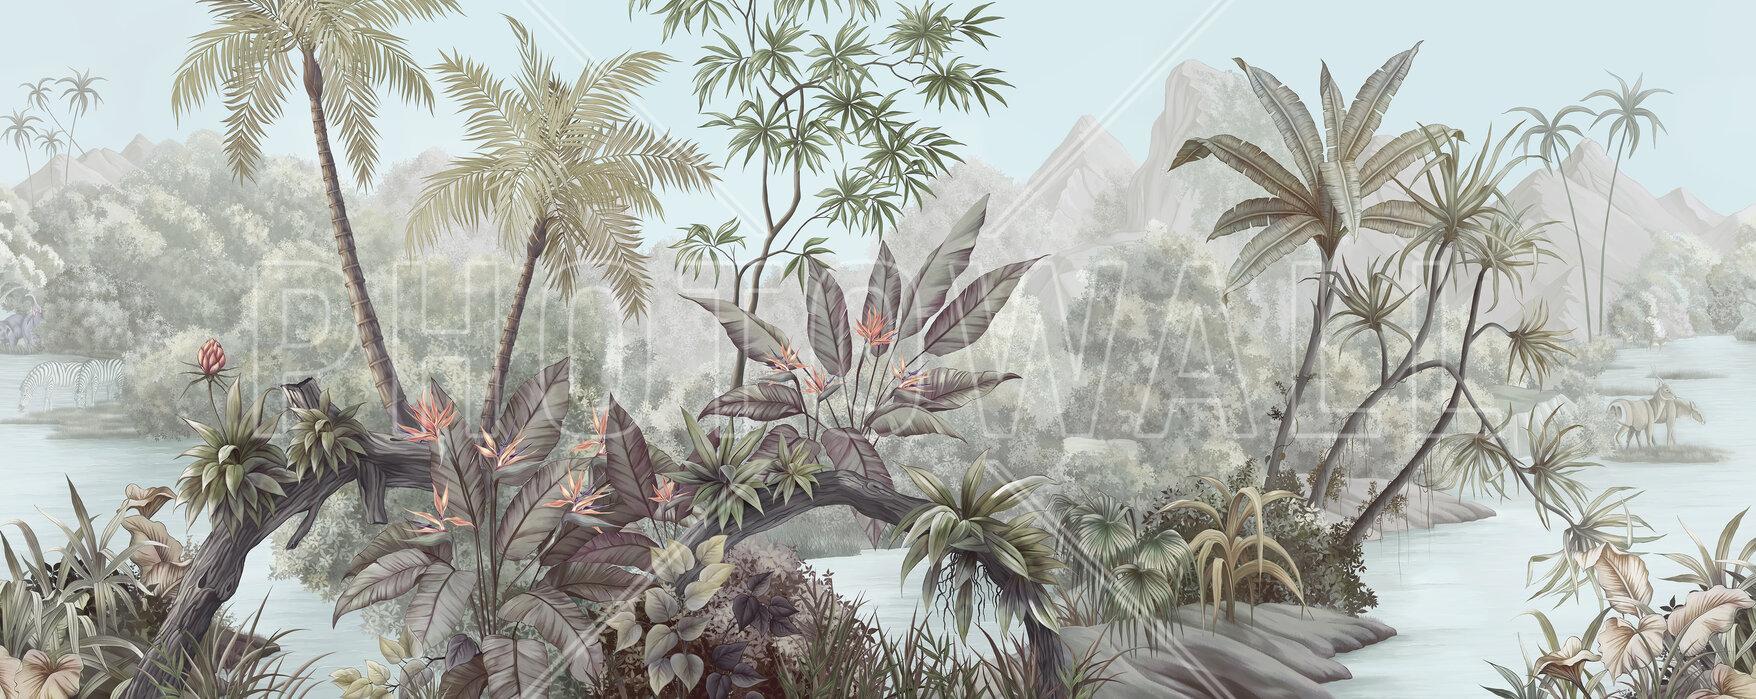 Tangled Jungle Trendy Wall Mural Photowall